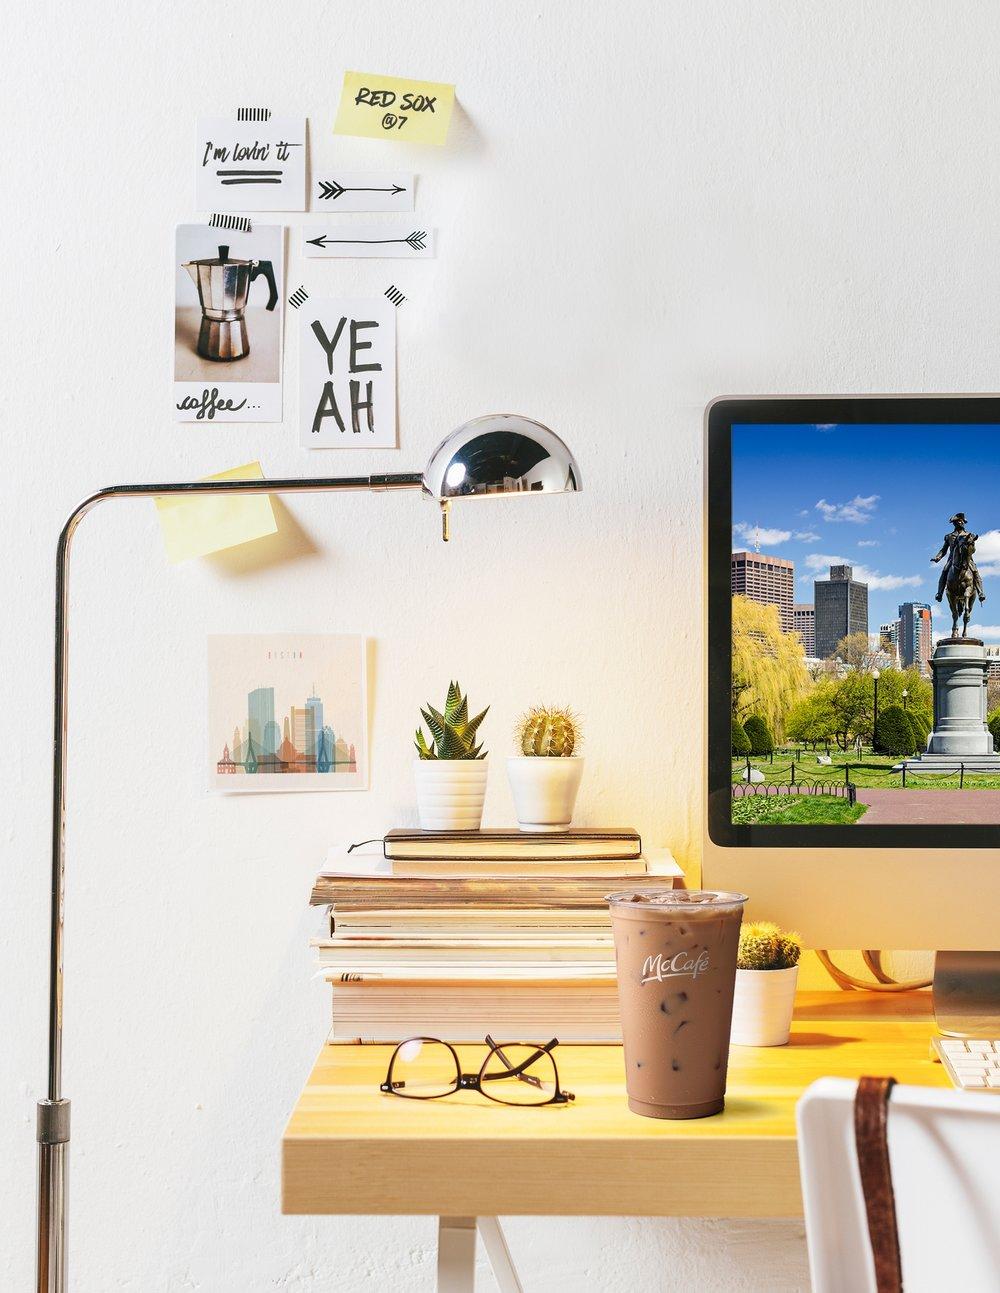 icedcoffee-desk.jpg